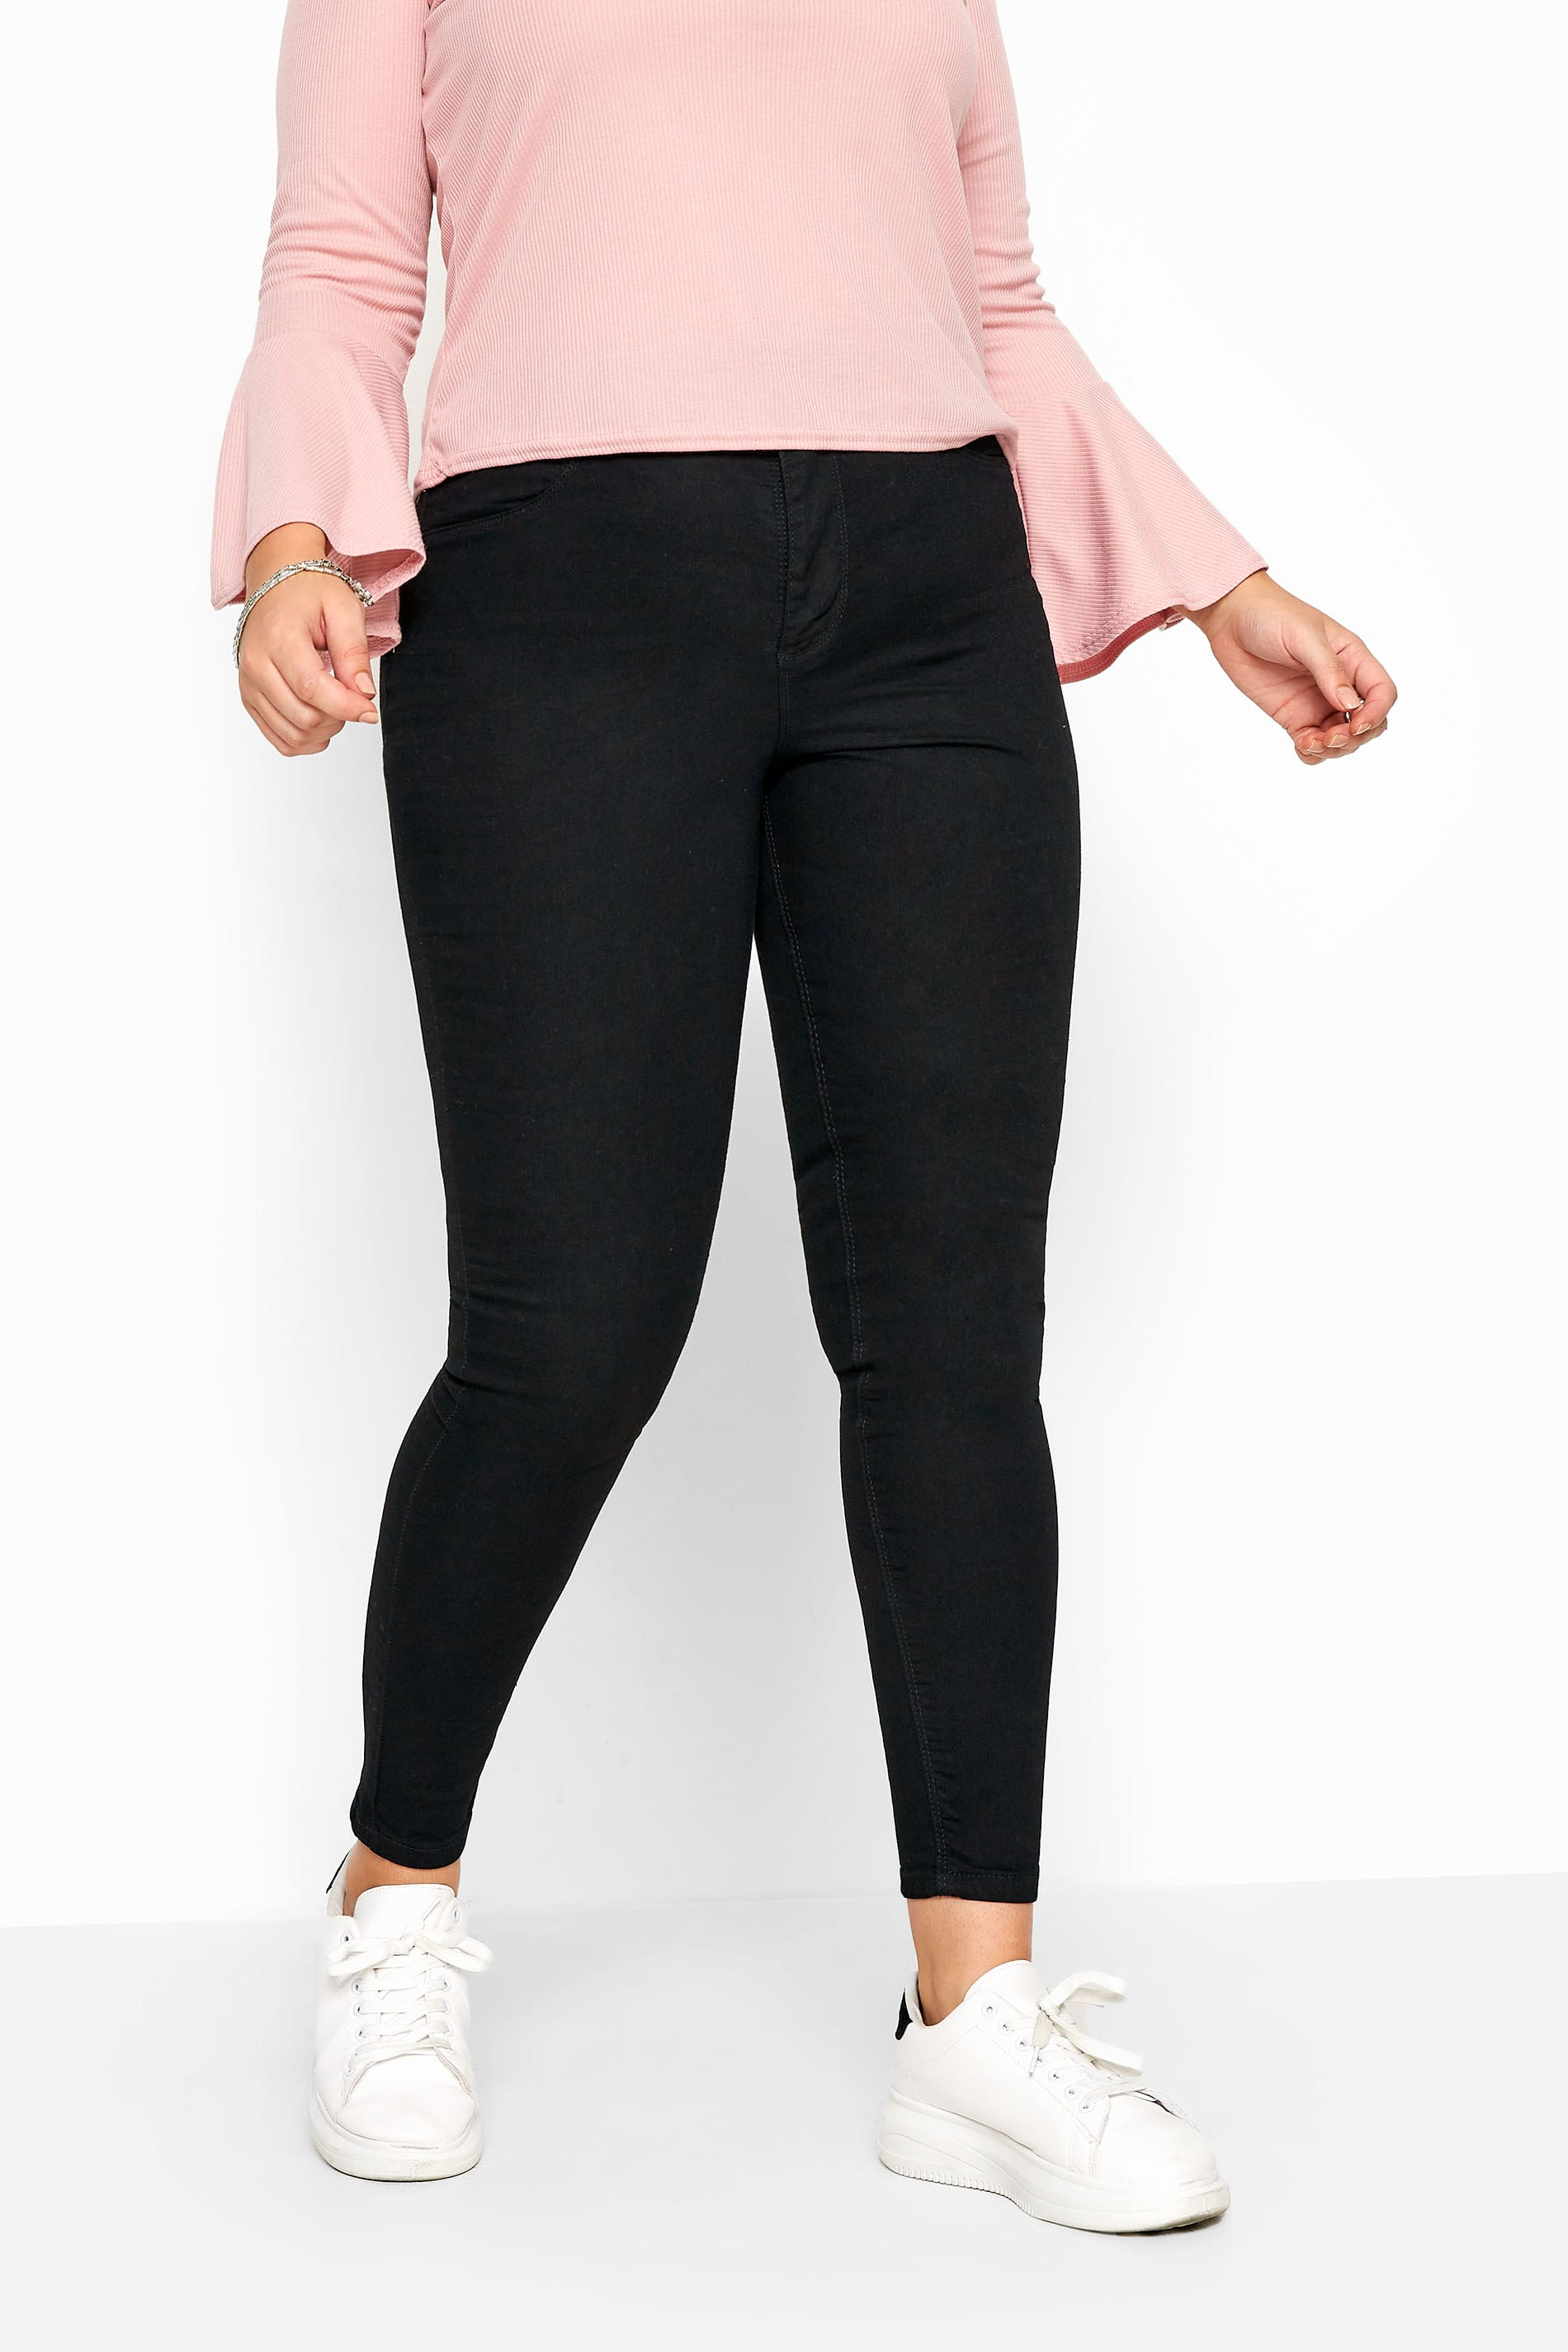 Black Super High Rise KIM Skinny Jeans